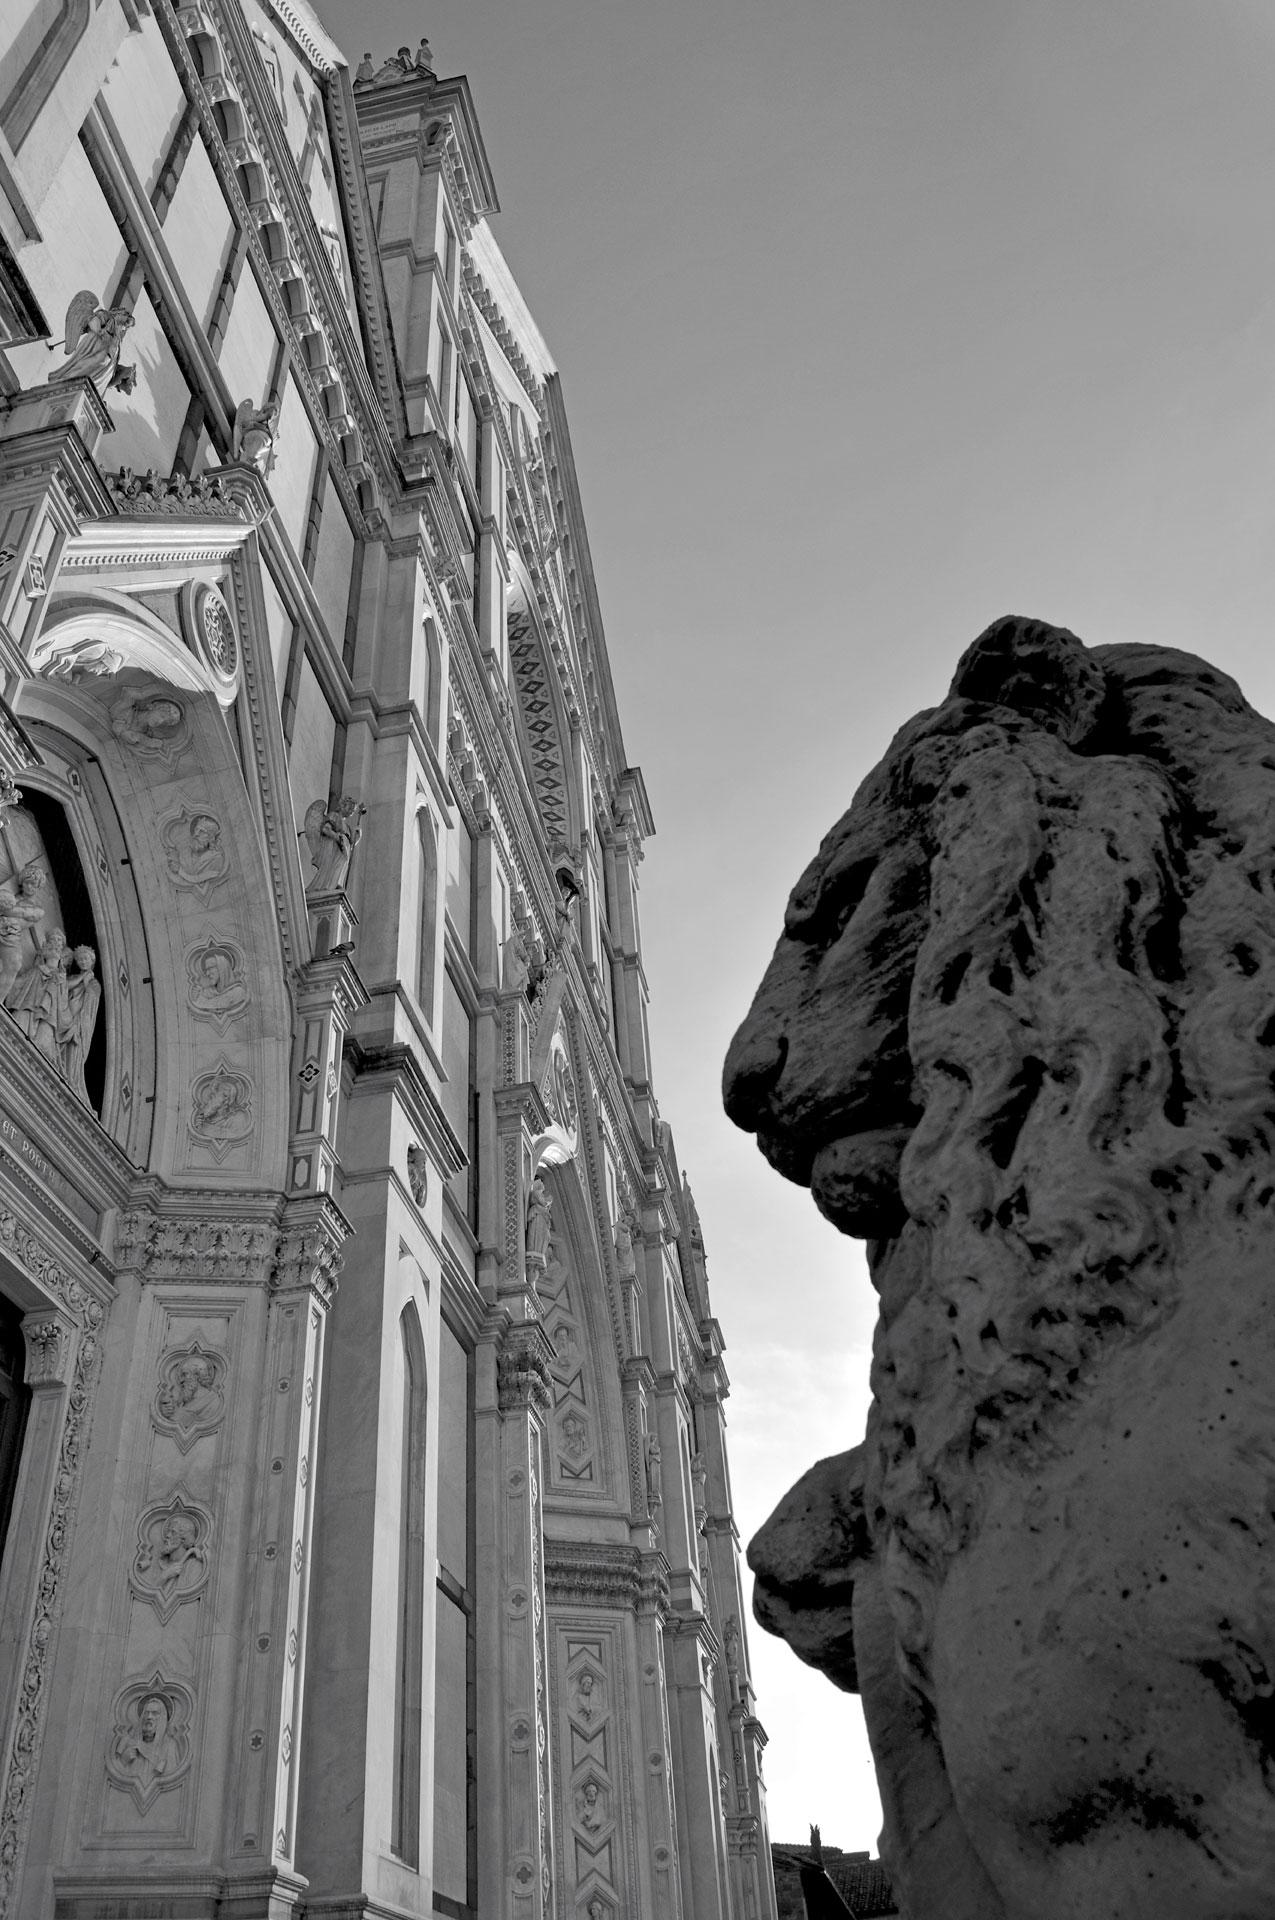 Guarding Santa Croce